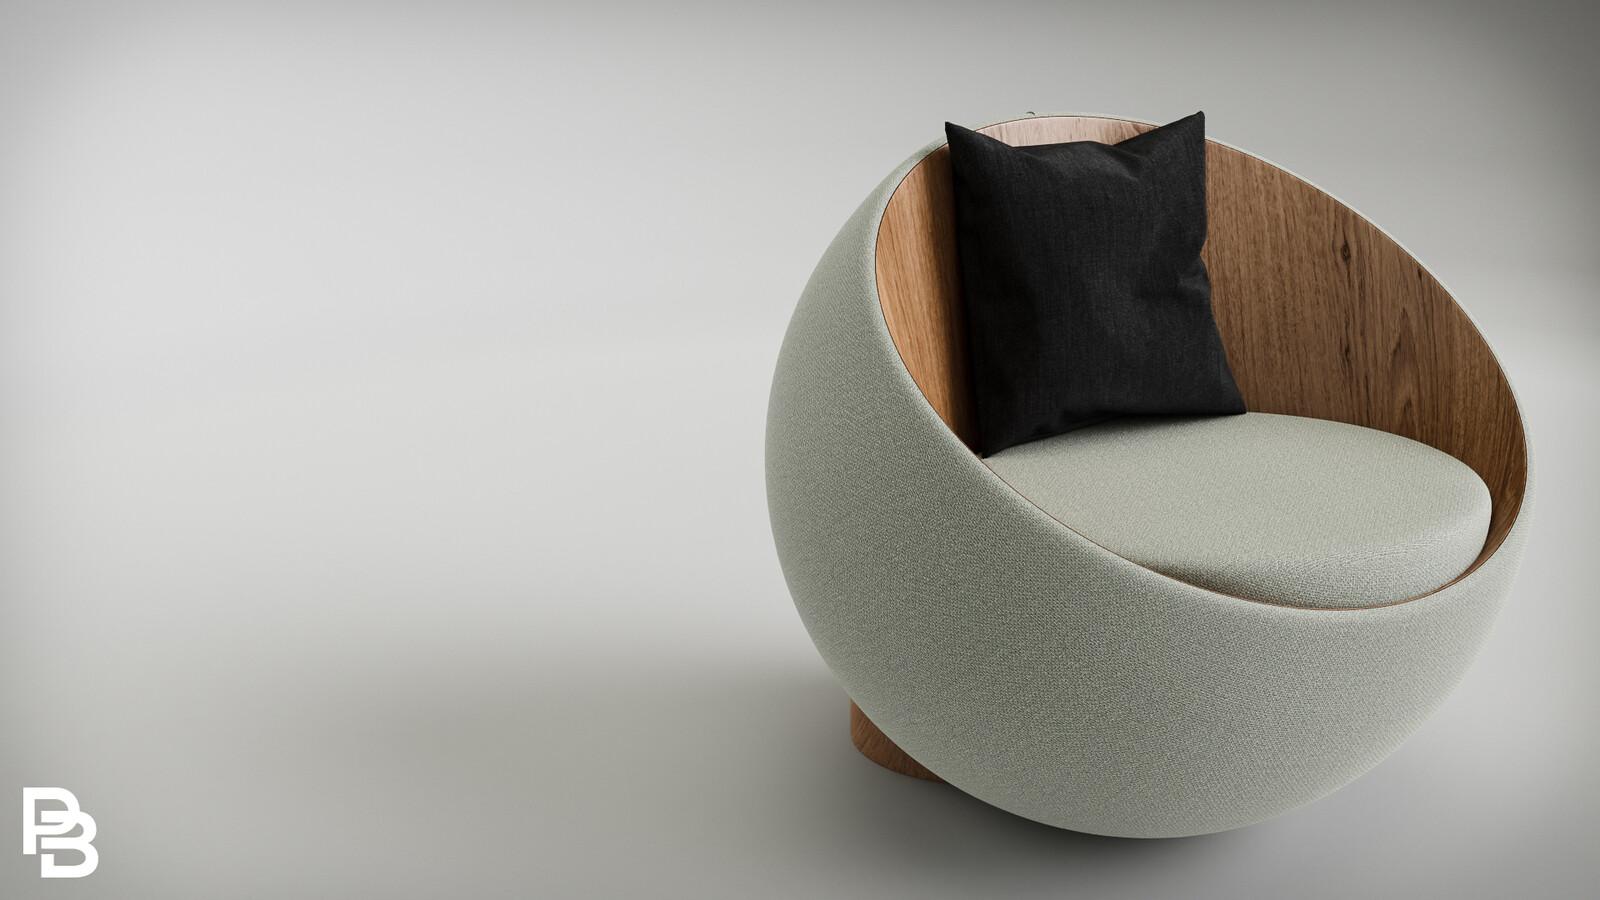 Spherical Seat